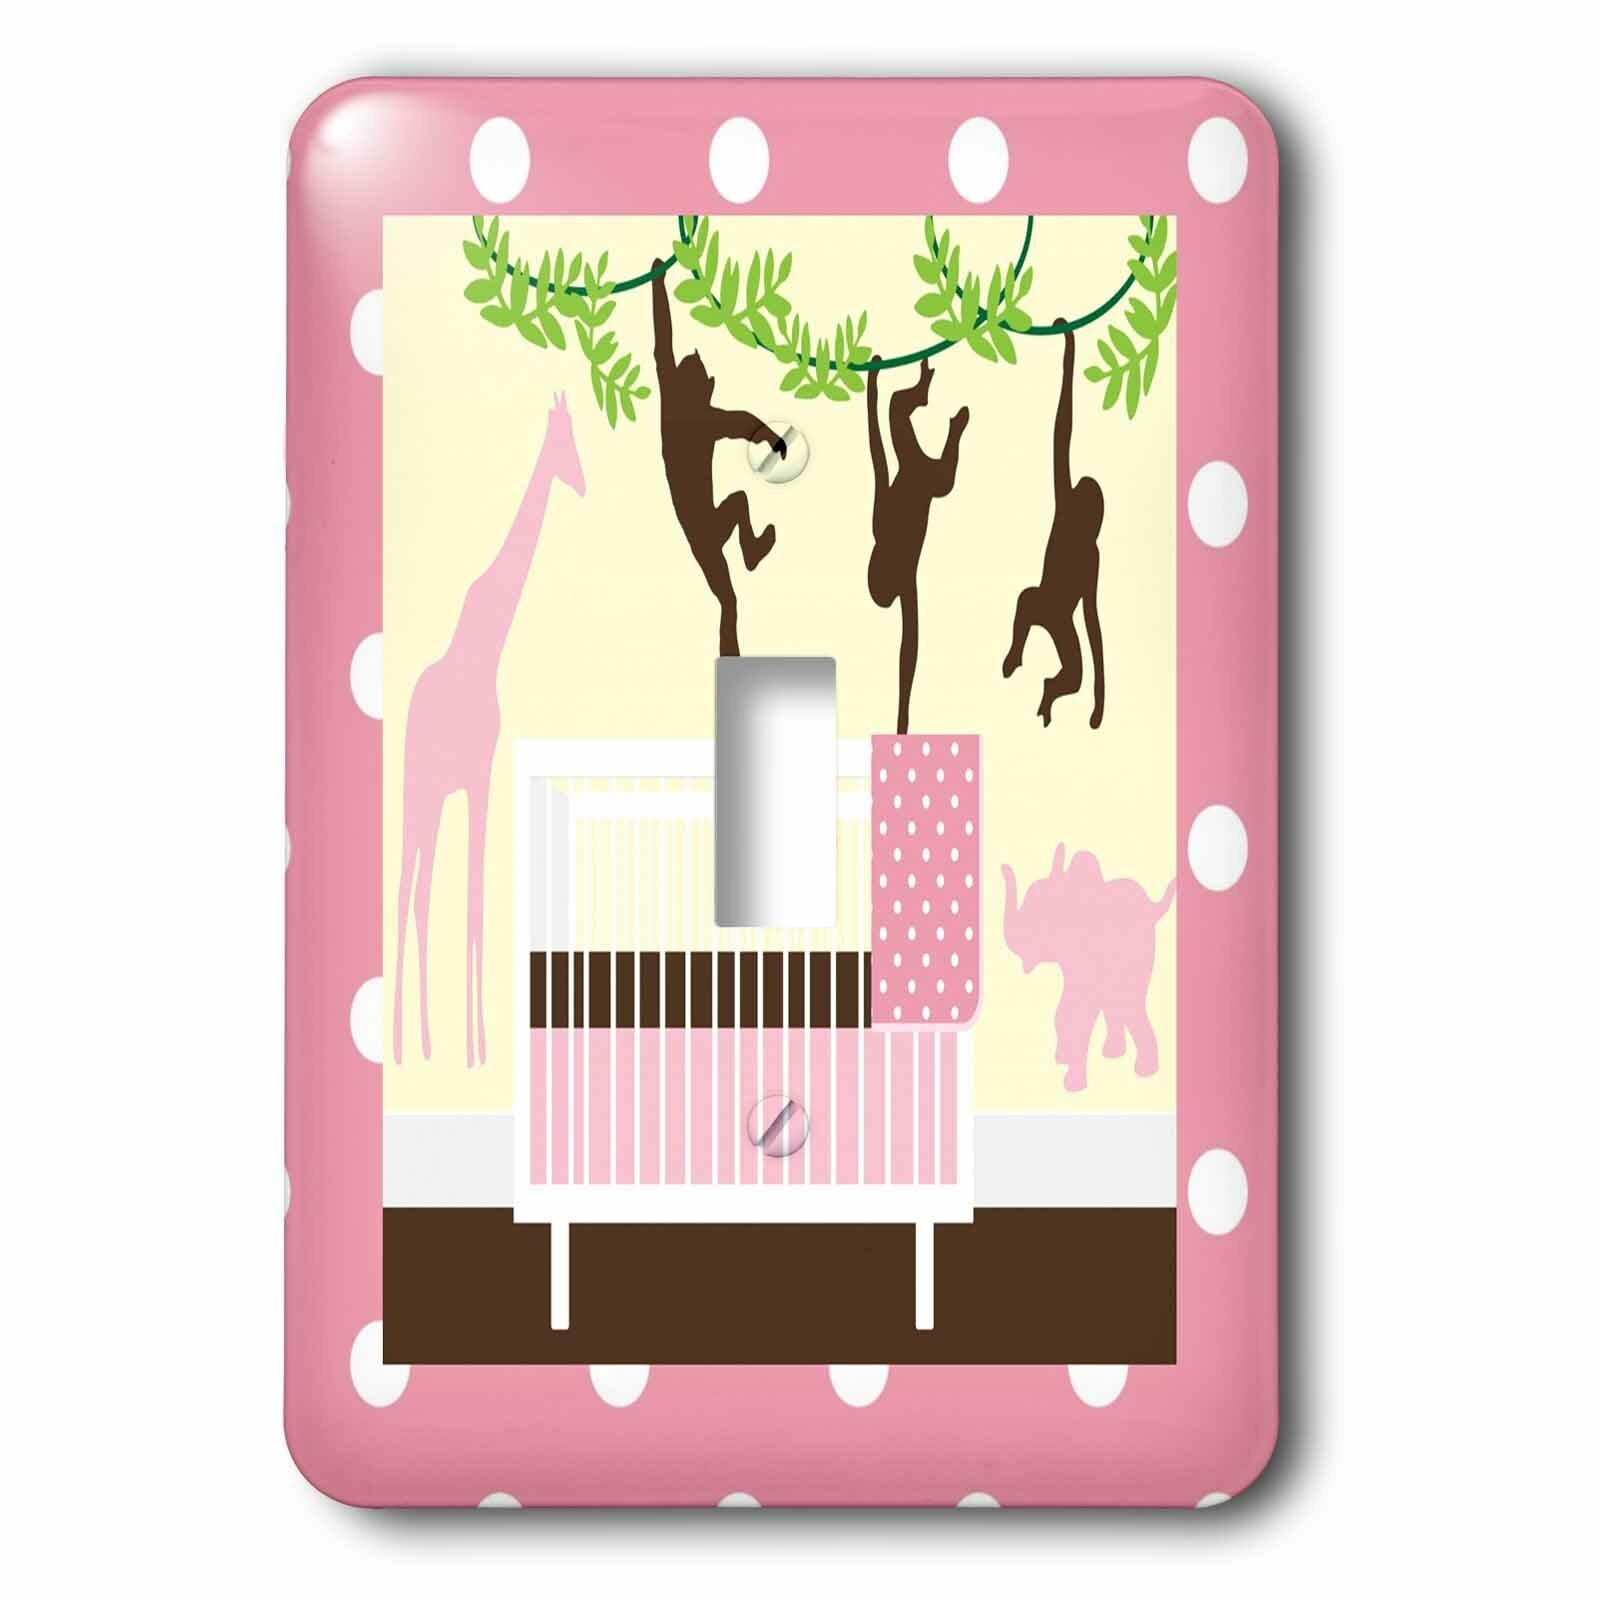 3drose Crib And Jungle Animals 1 Gang Toggle Light Switch Wall Plate Wayfair Ca